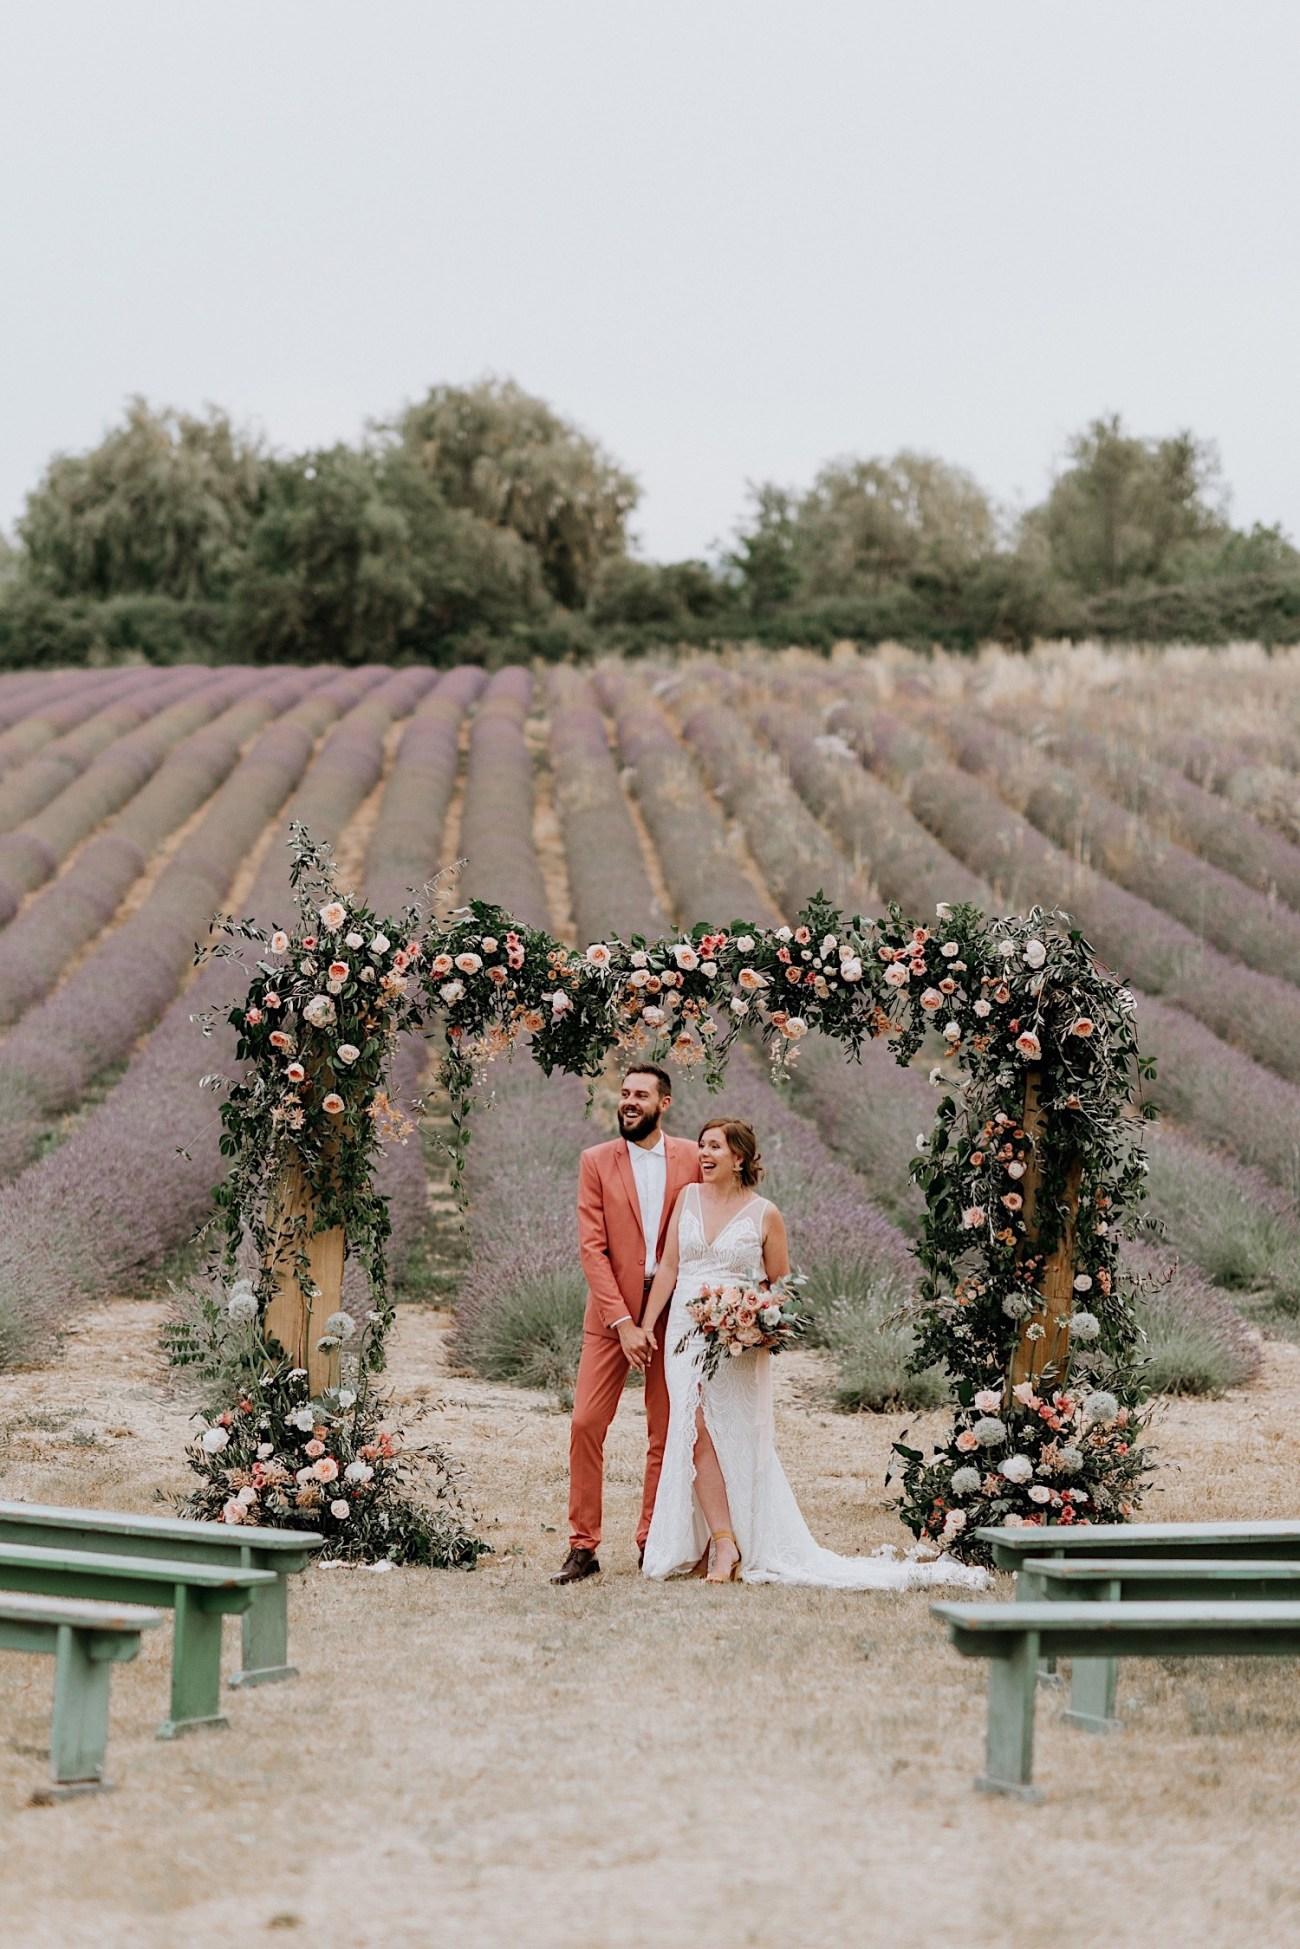 Terre Ugo Un Marriage En Provence Lavender Field Wedding French Wedding Provence Wedding Destination Wedding France Photographe De Marriage Provence France Anais Possamai Photography 23